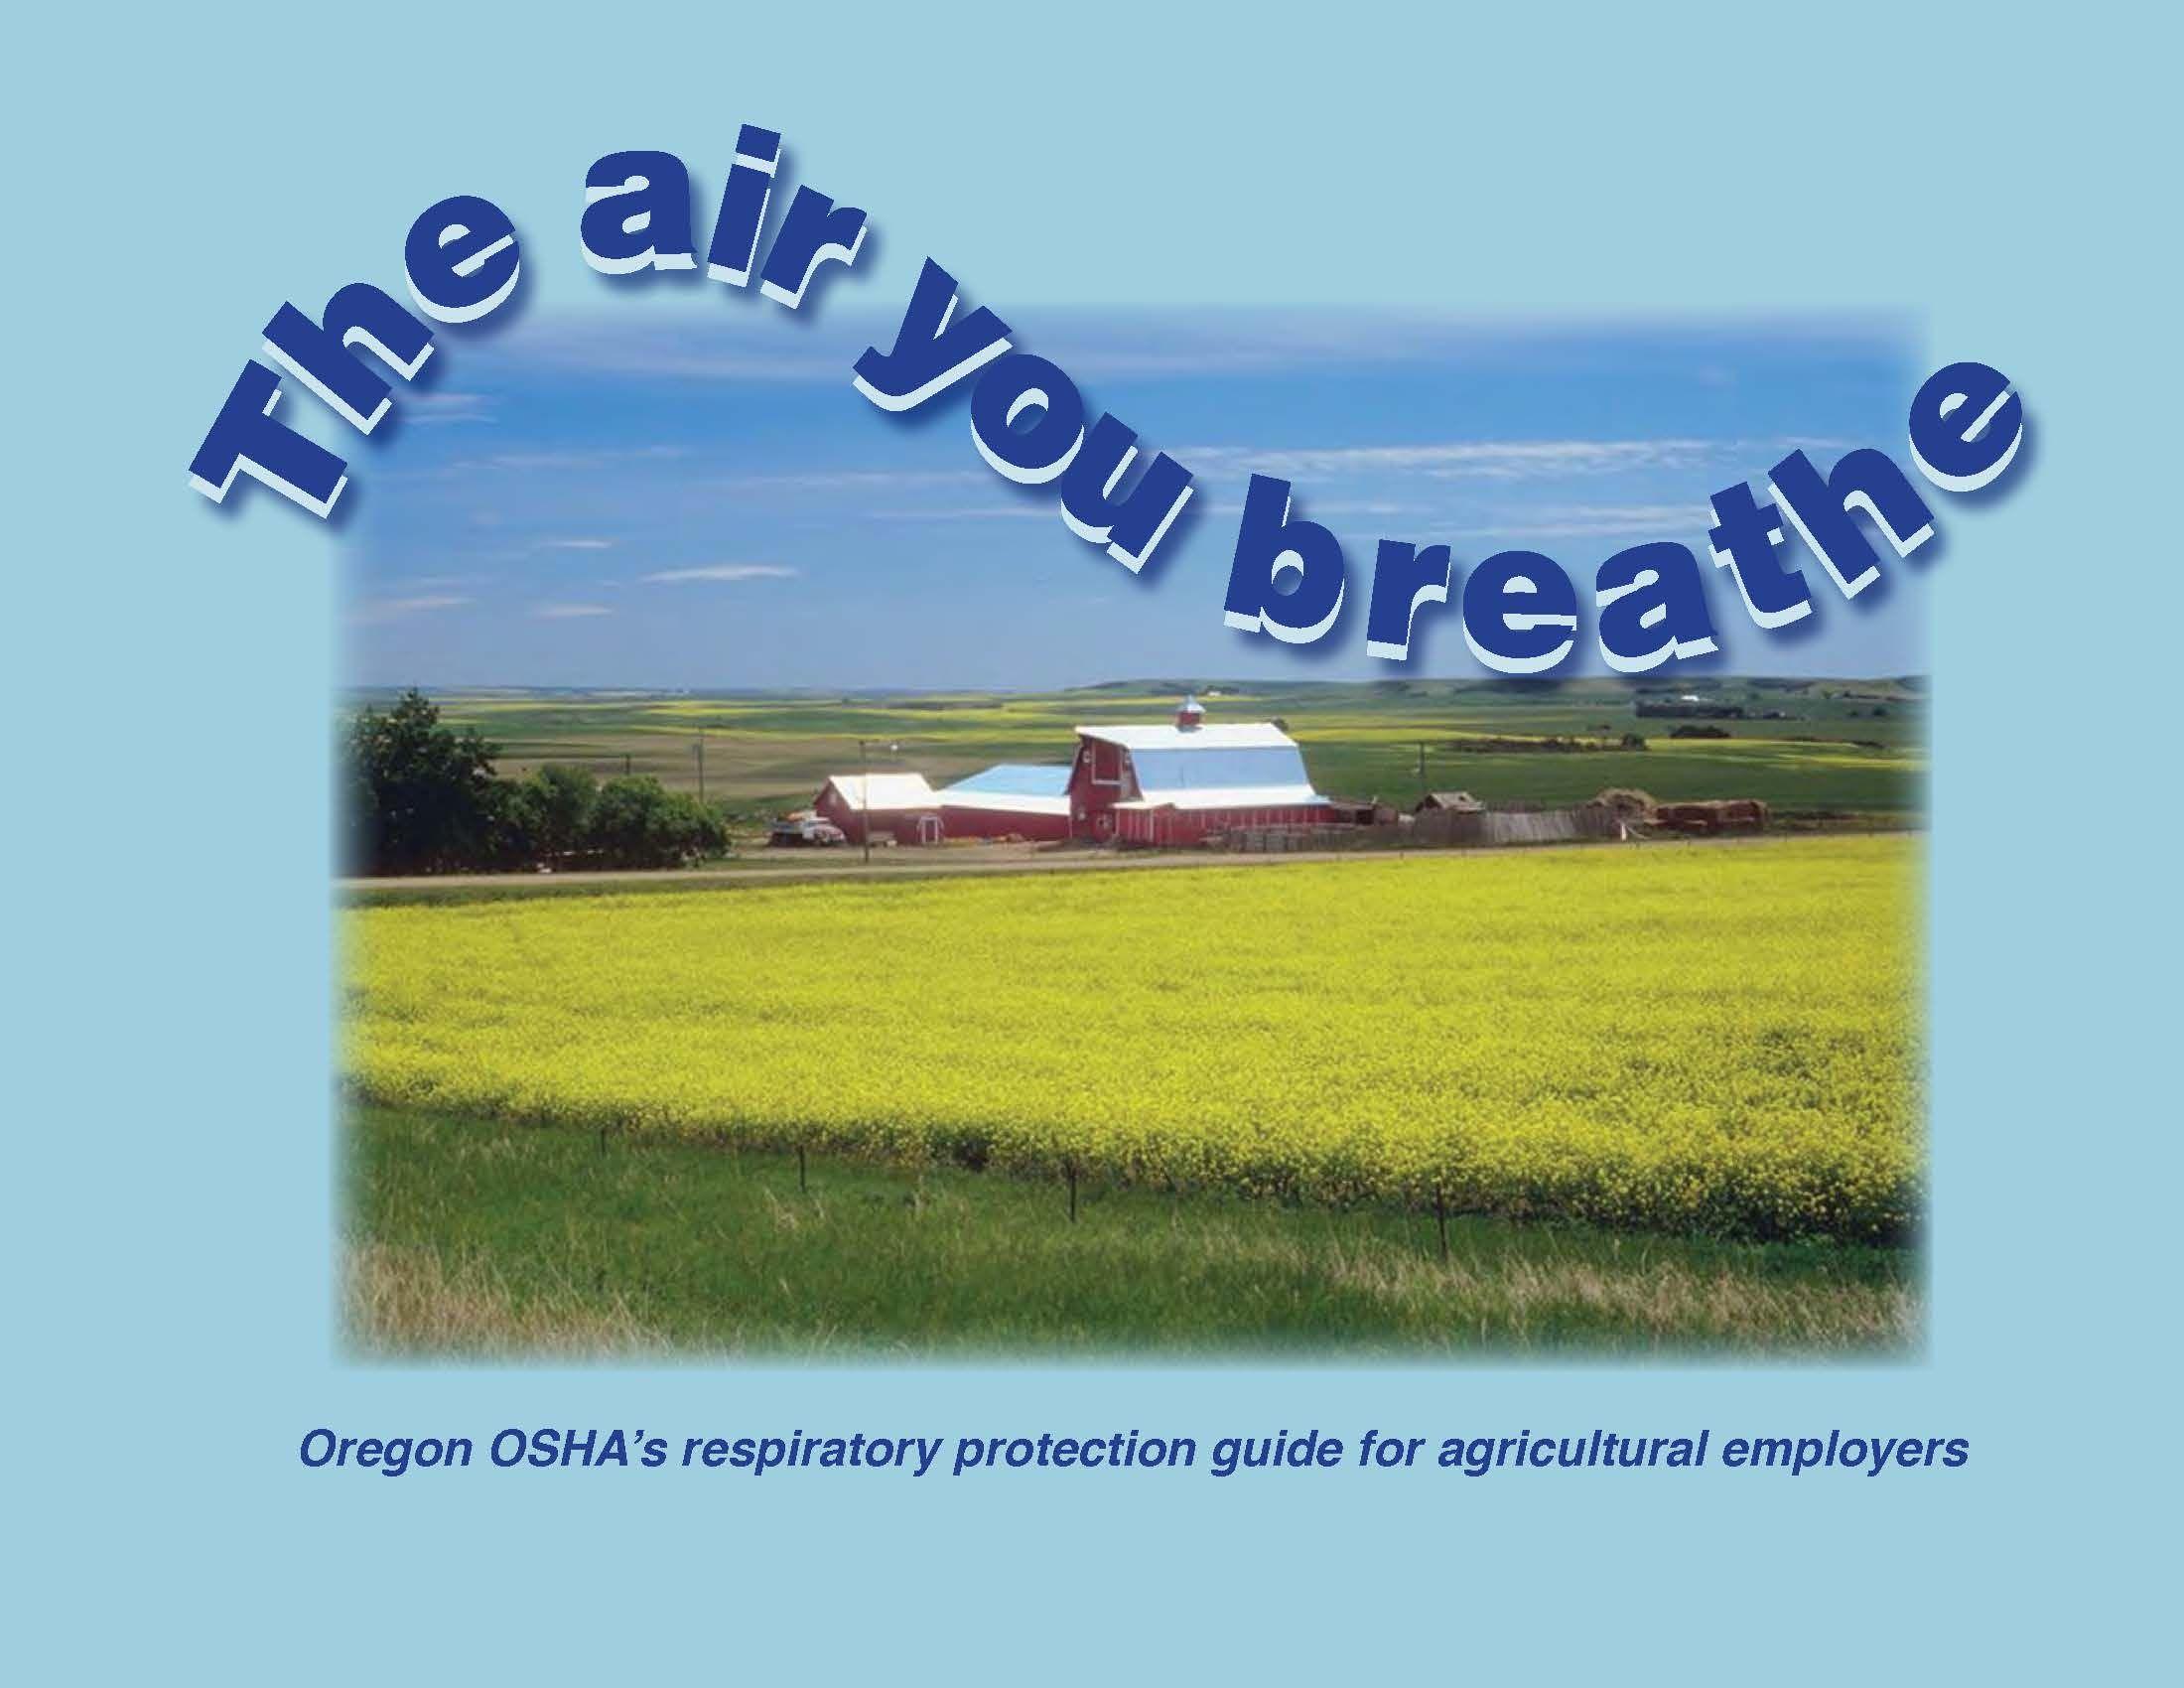 The air you breathe Oregon OSHA's respiratory protection